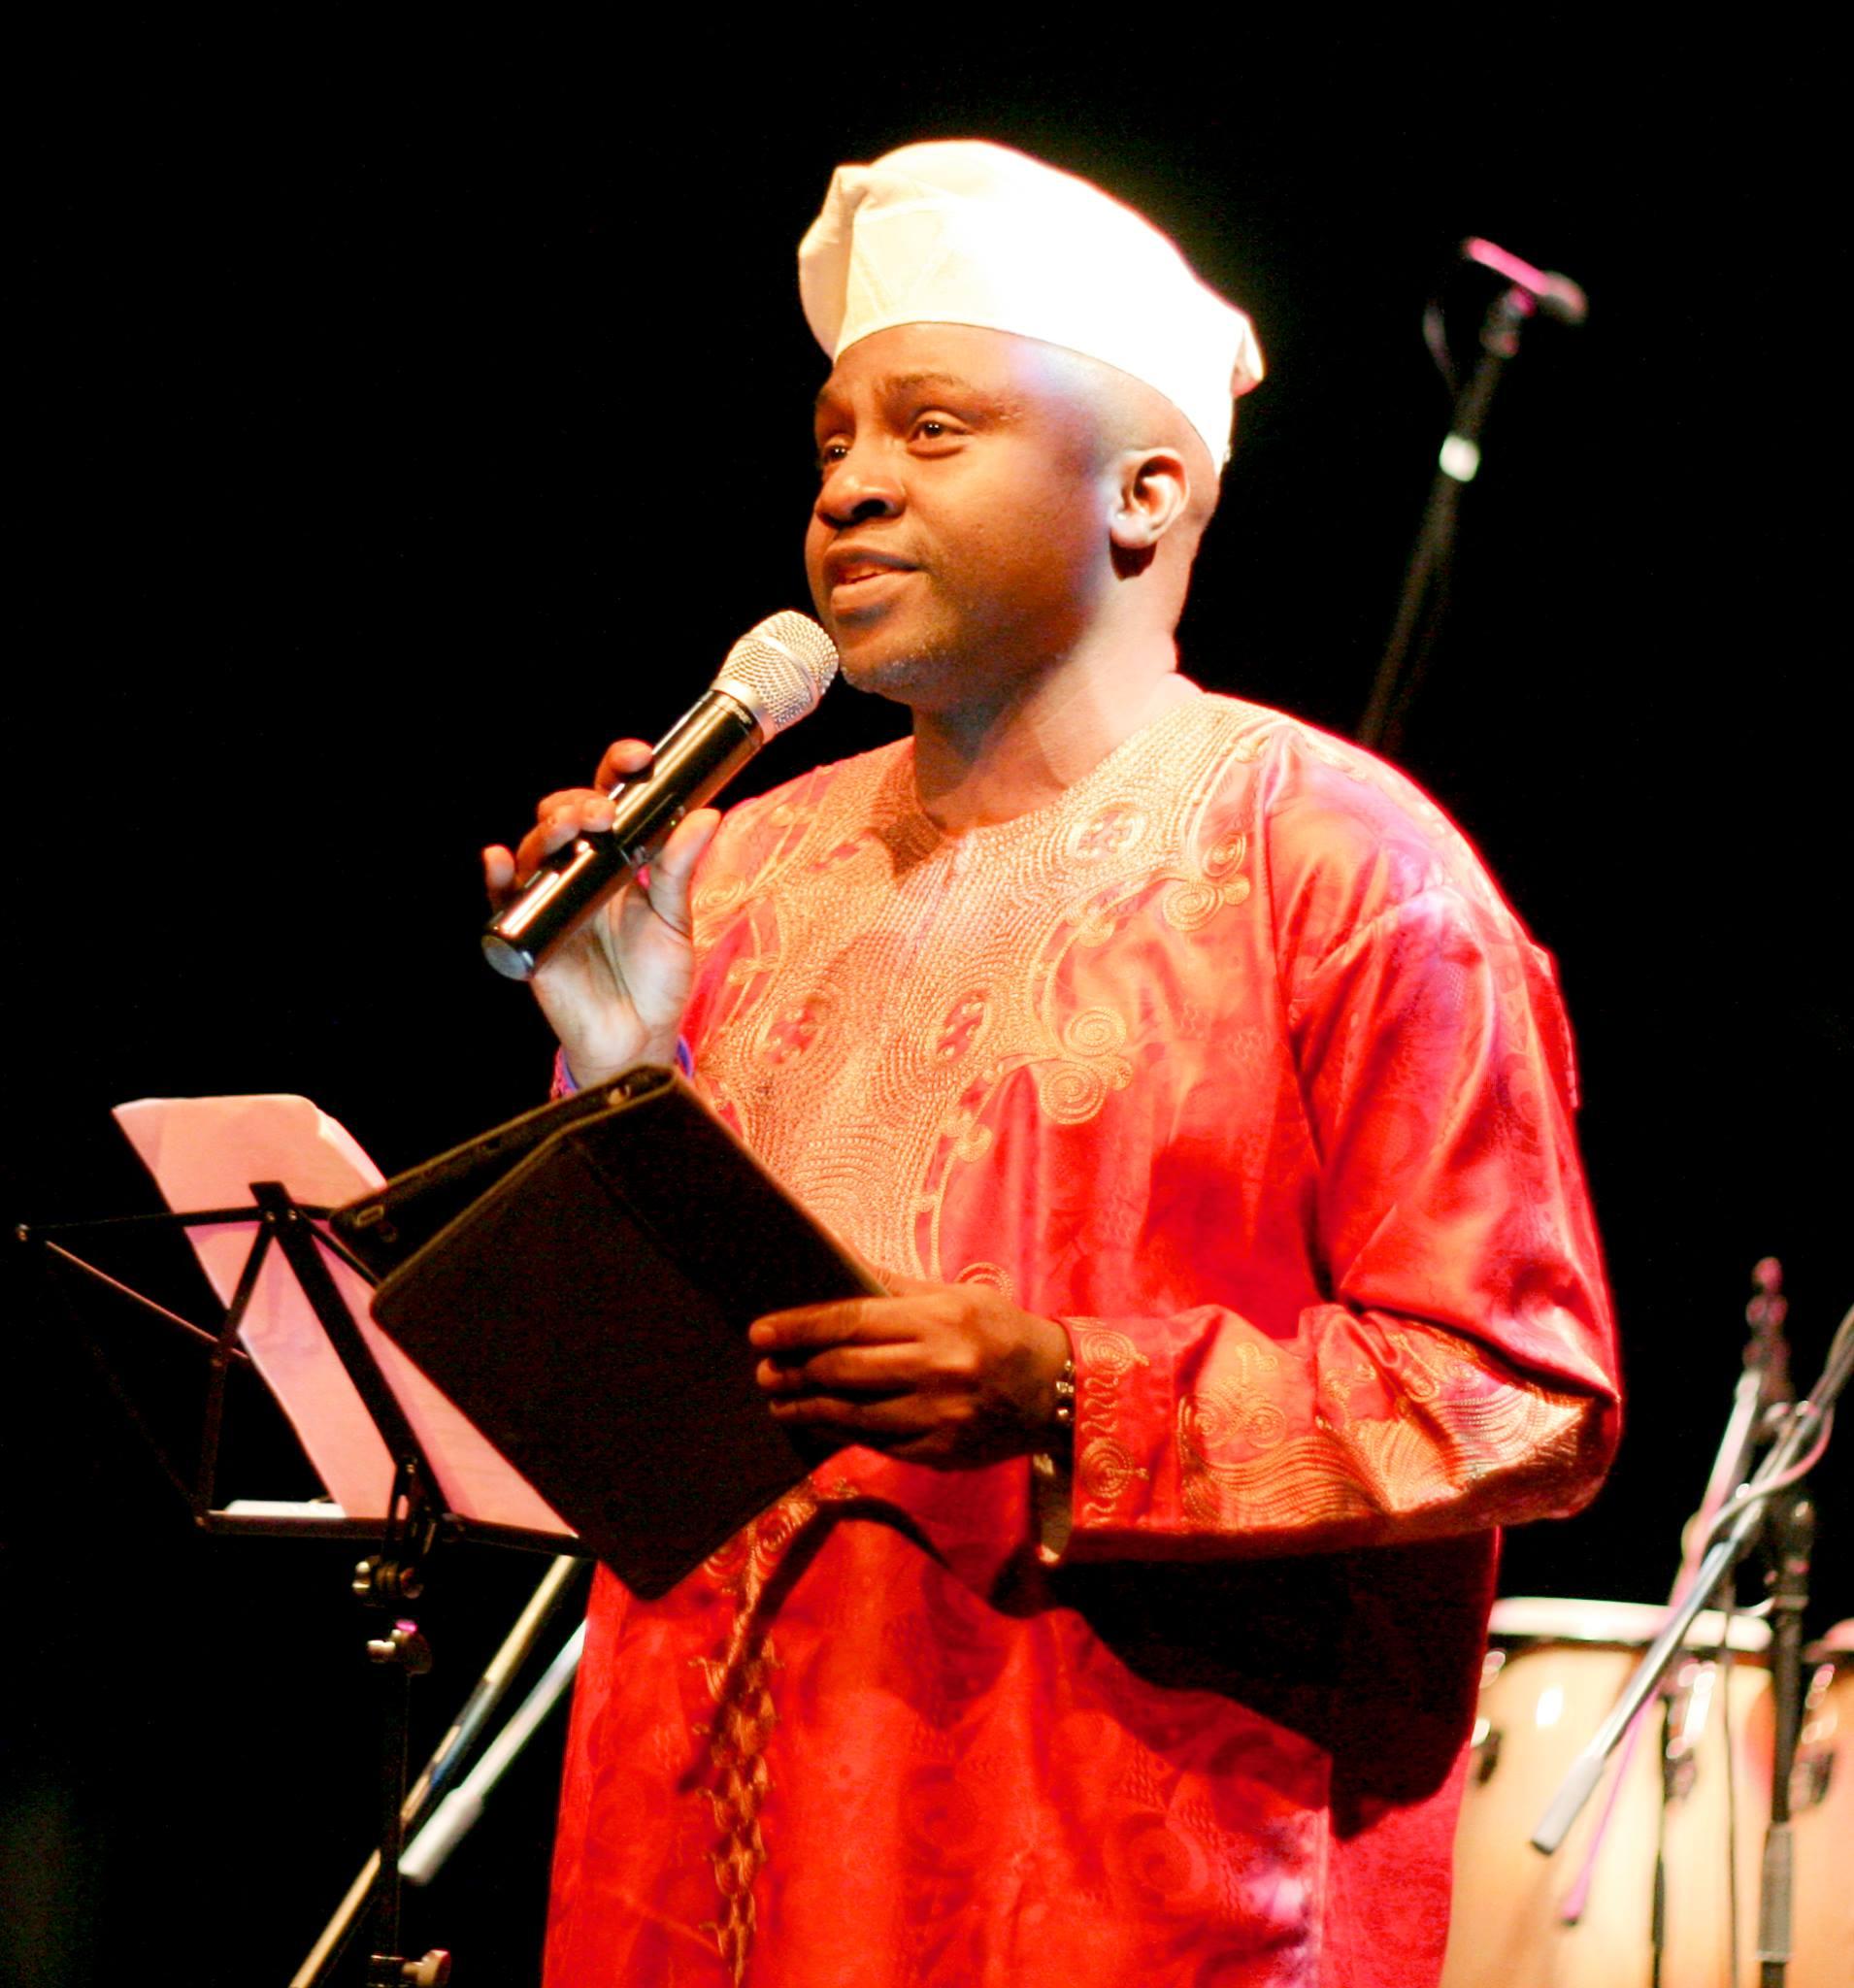 MC @ Oba Nla Concert. 2009